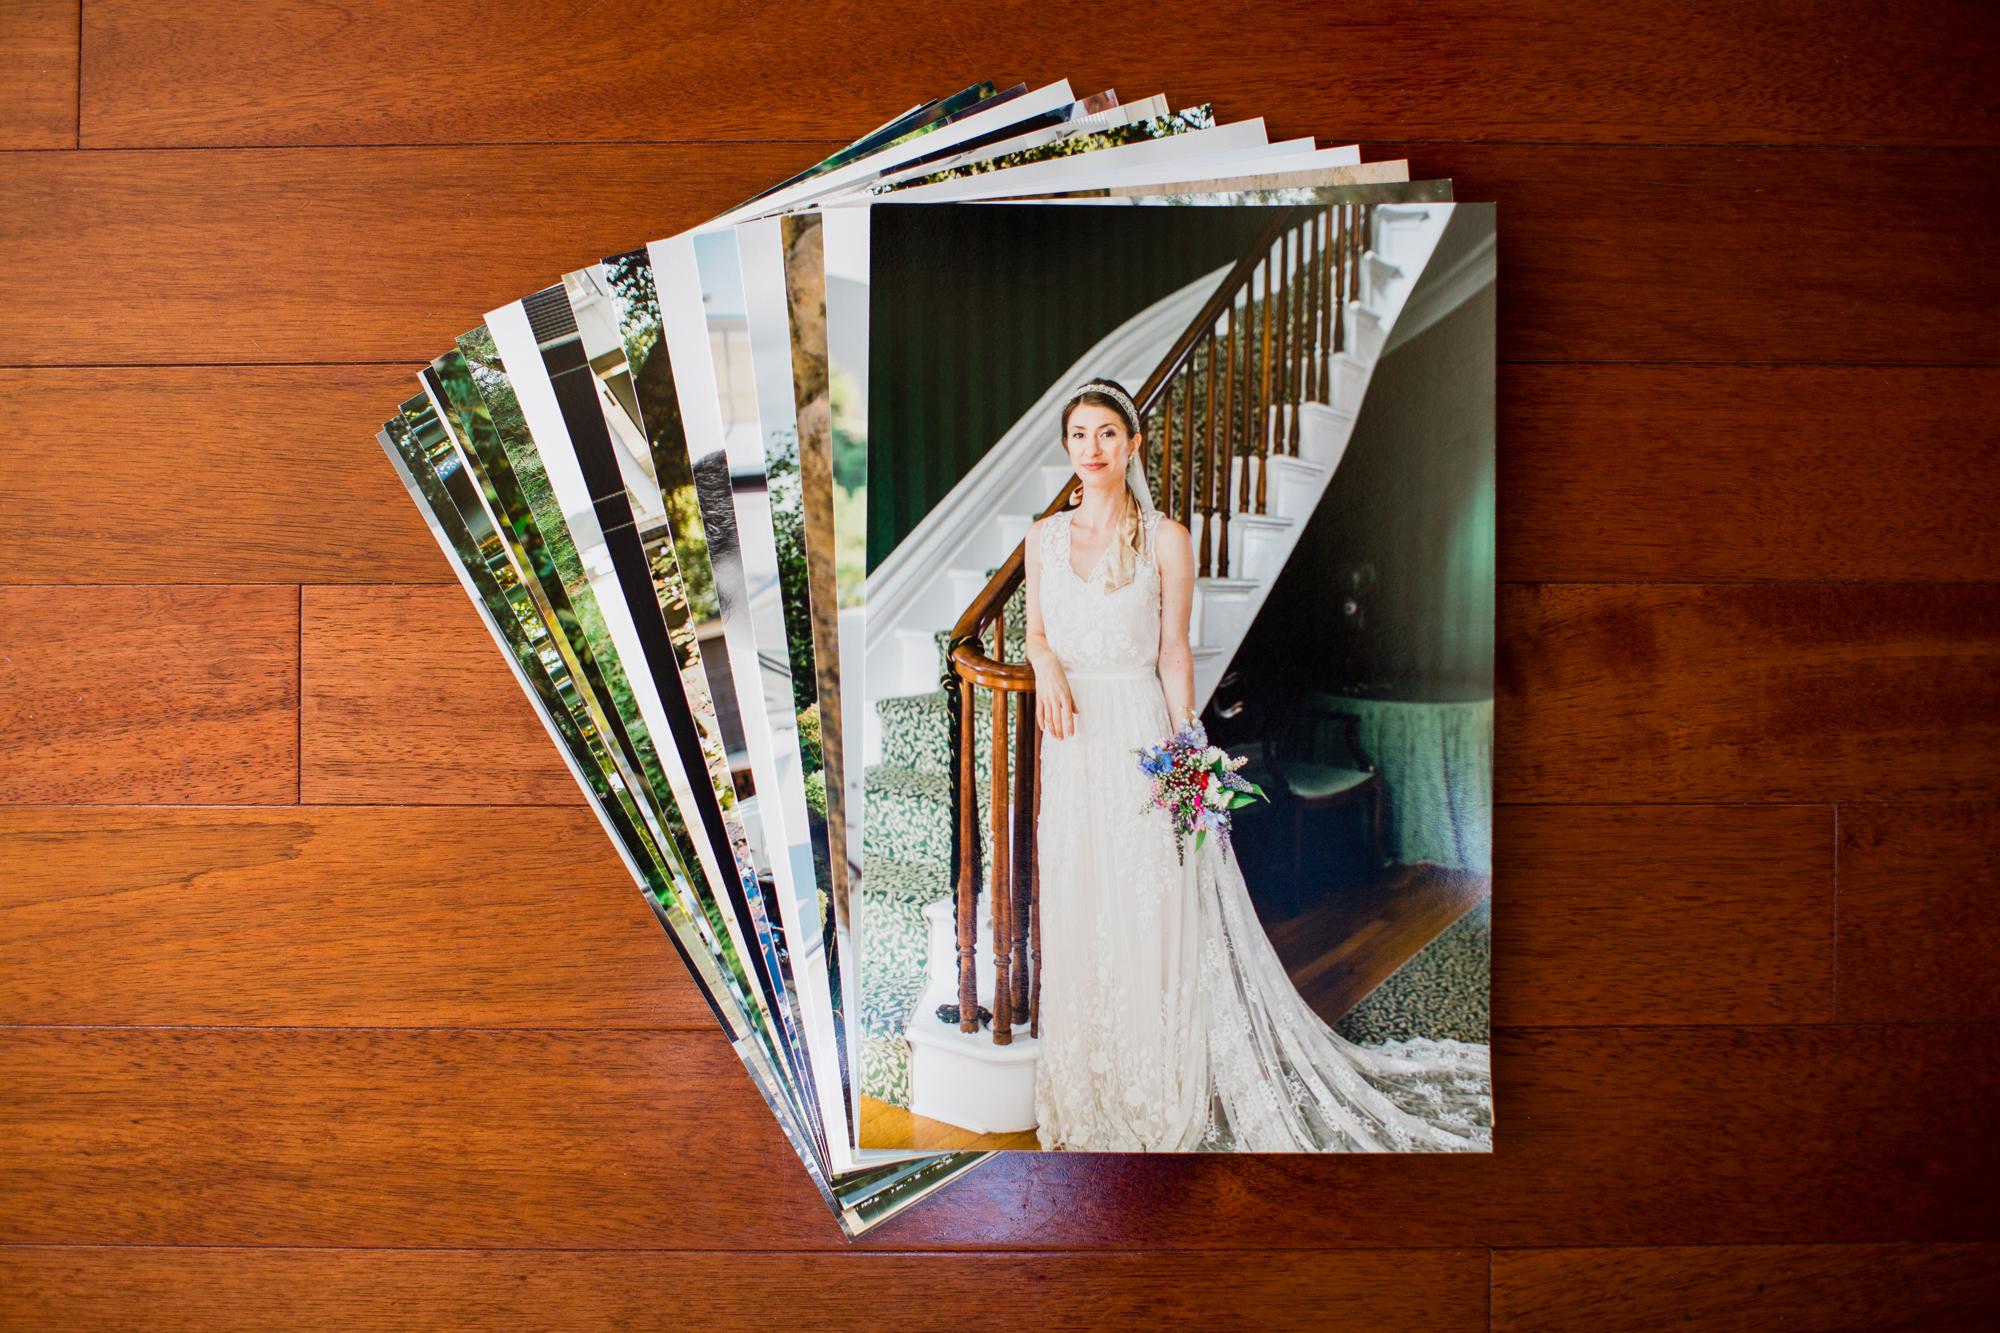 001-los-angeles-wedding-photography-todd-danforth.jpg